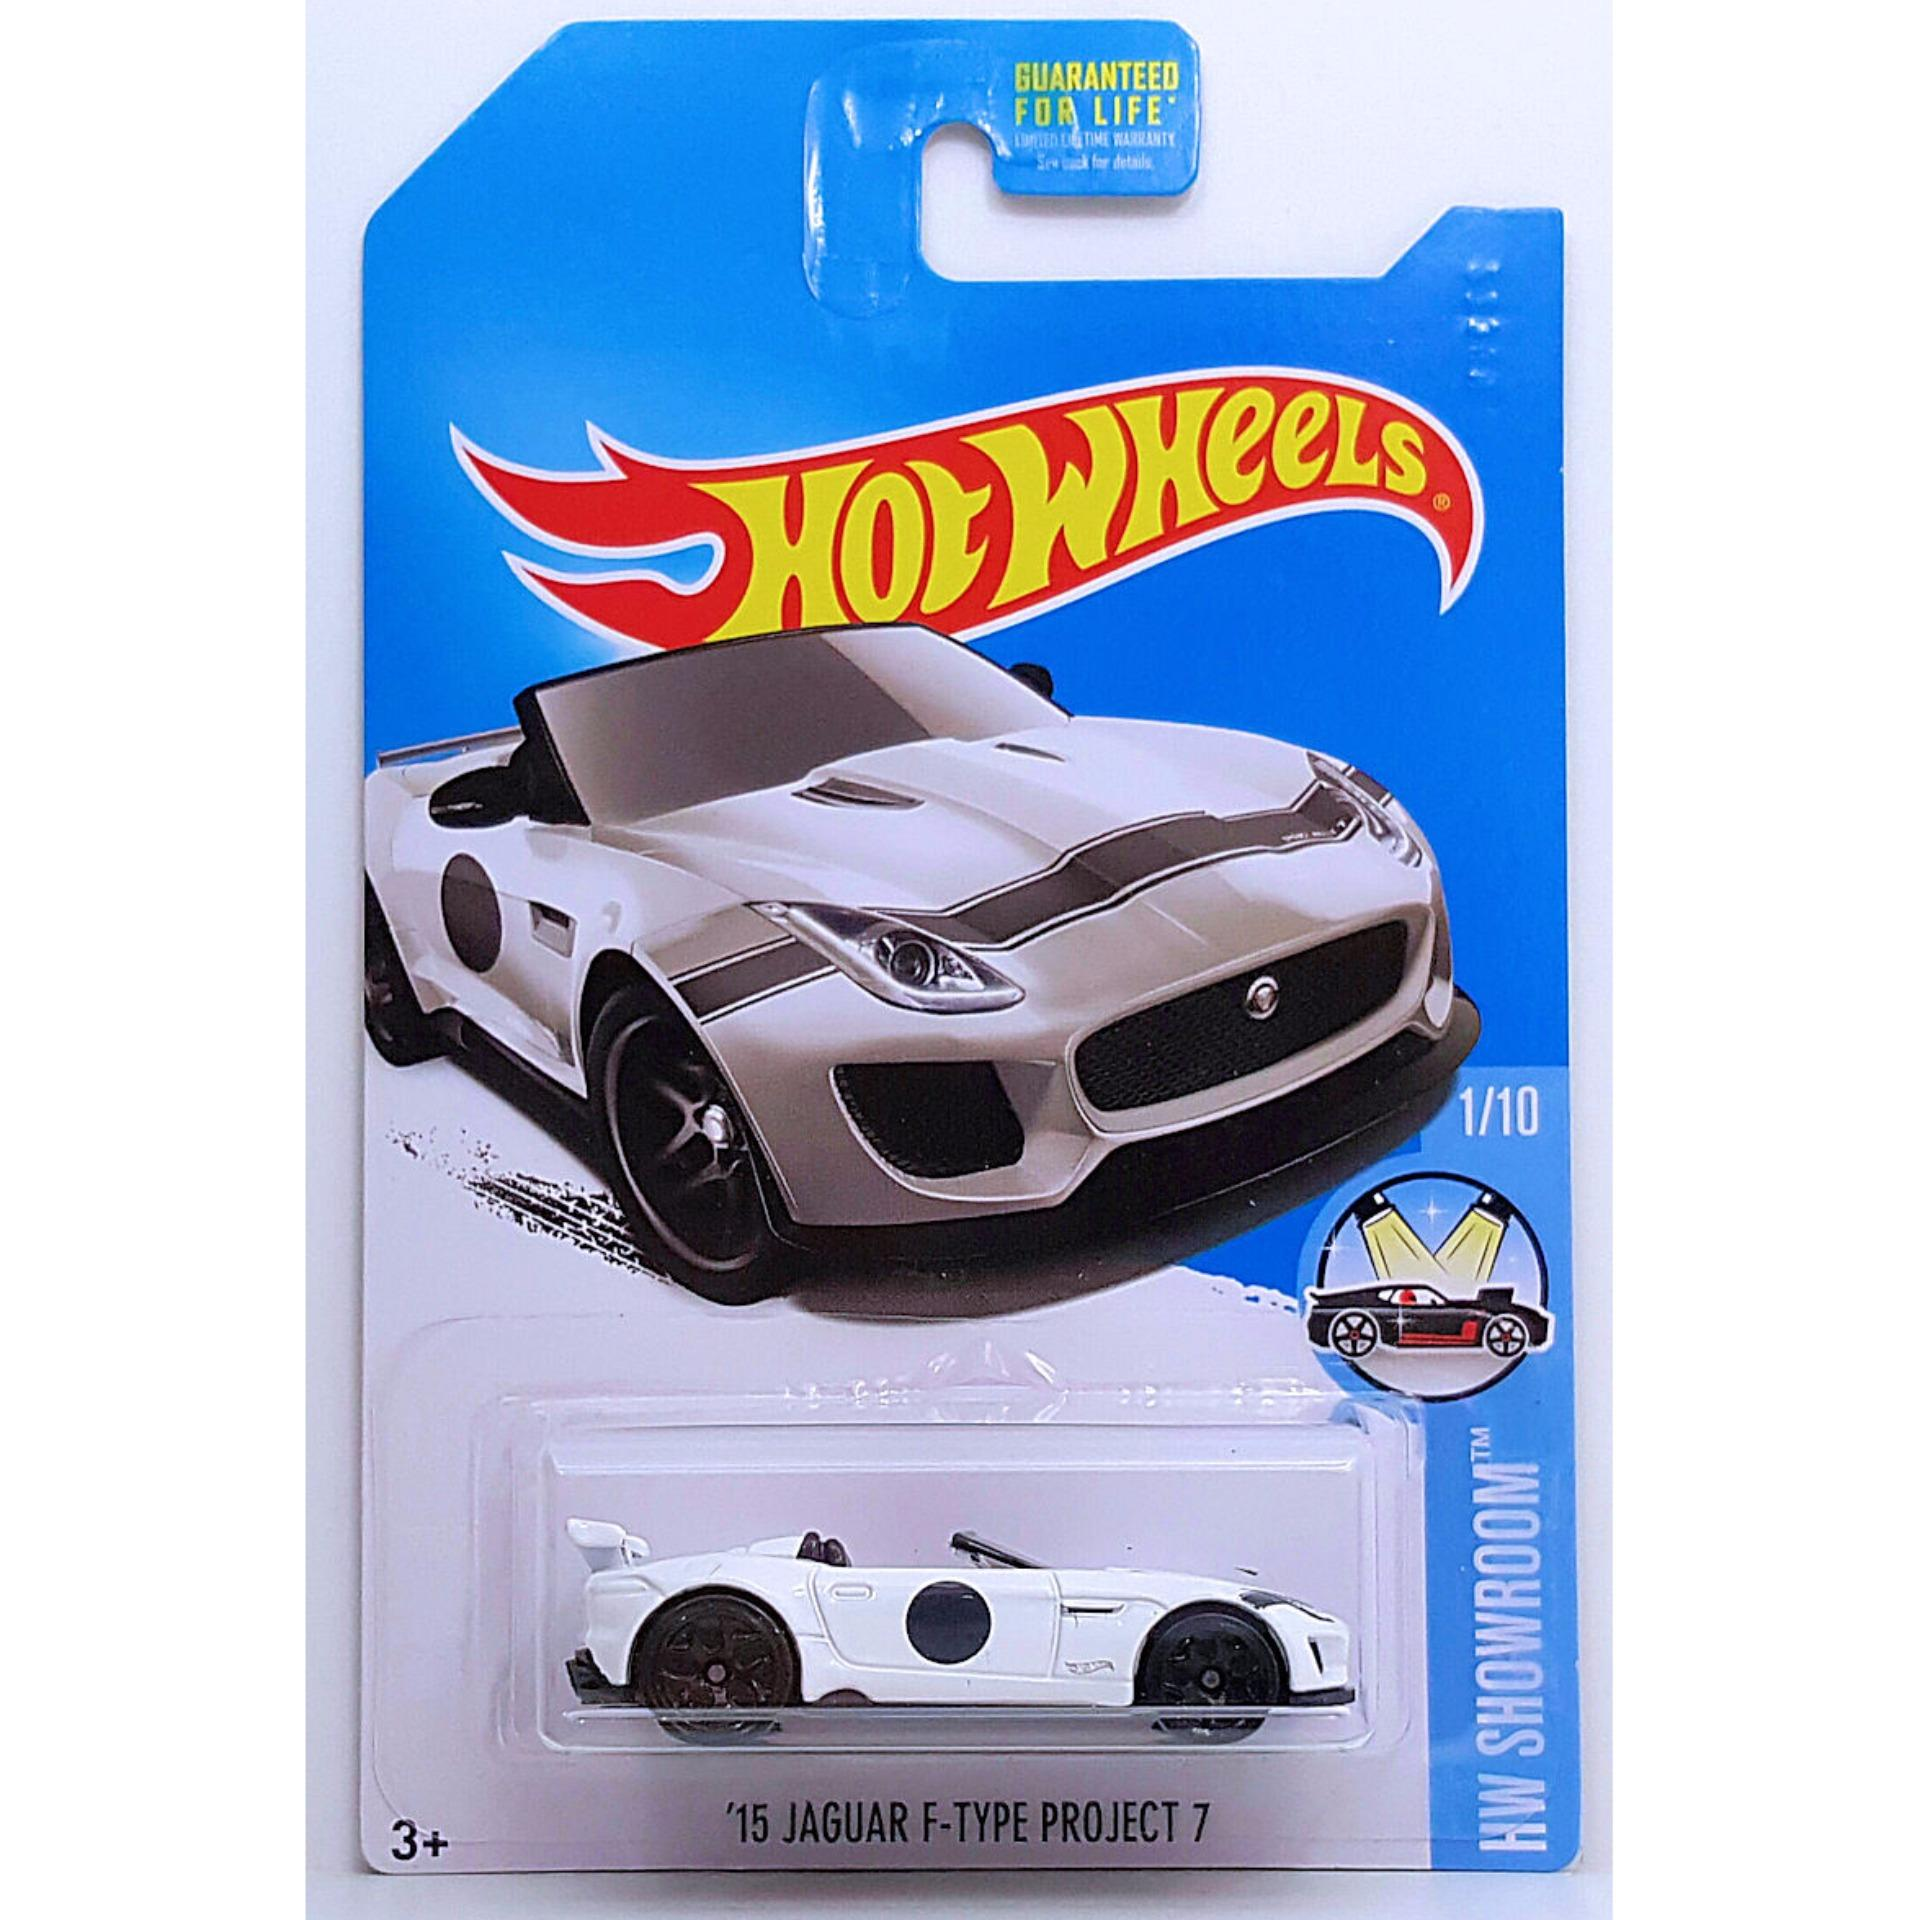 Xe mô hình tỉ lệ 1:64 Hot Wheels 2016 Kmart '15 Jaguar F-TypeProject 7 - Trắng